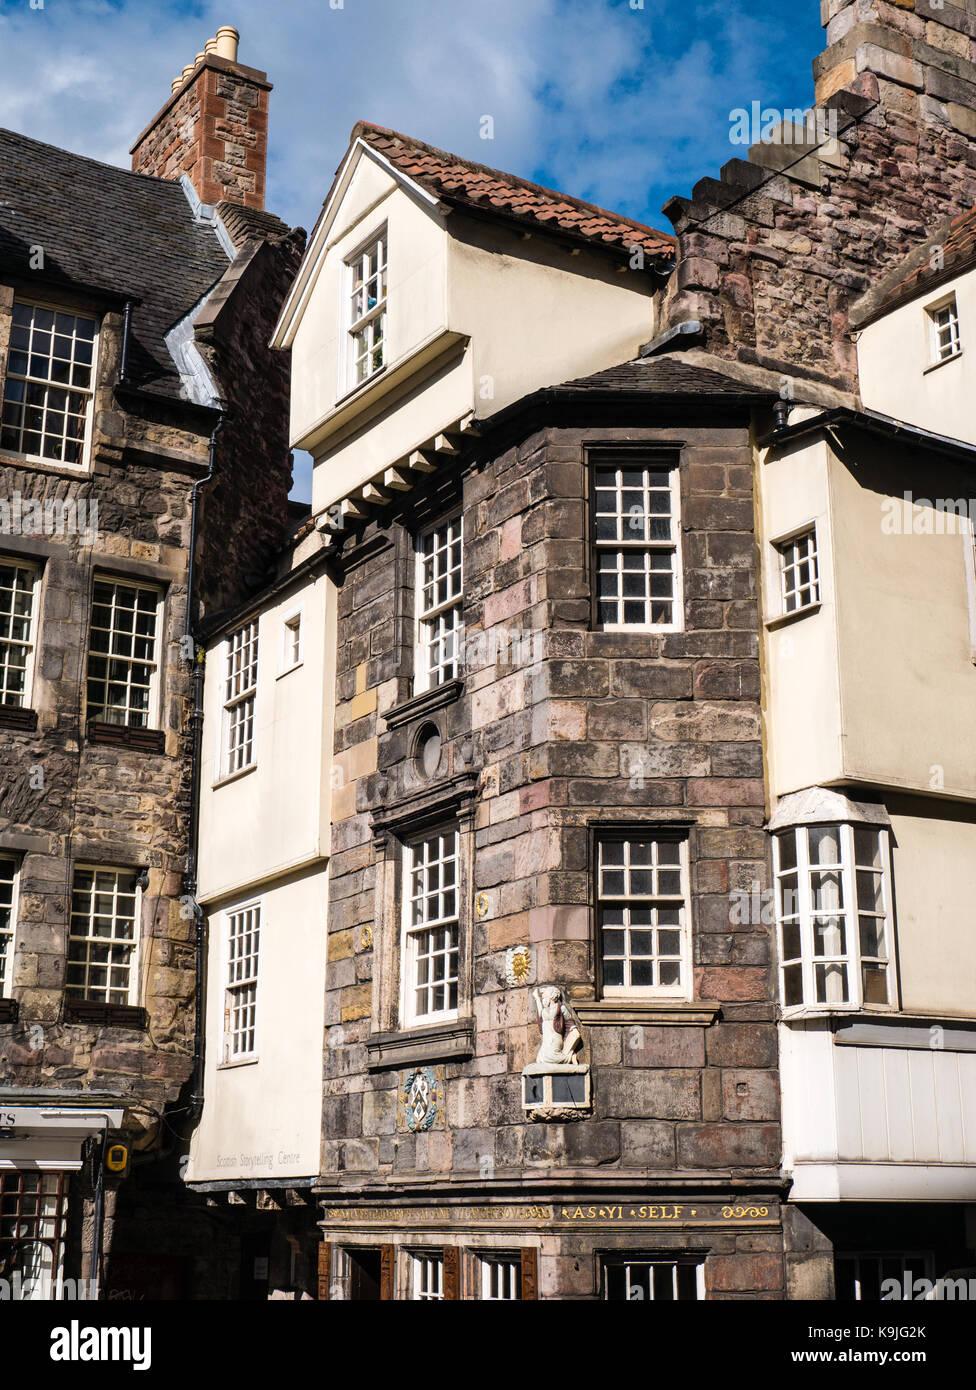 Scottish storytelling centre stock photos scottish for Classic house edinburgh